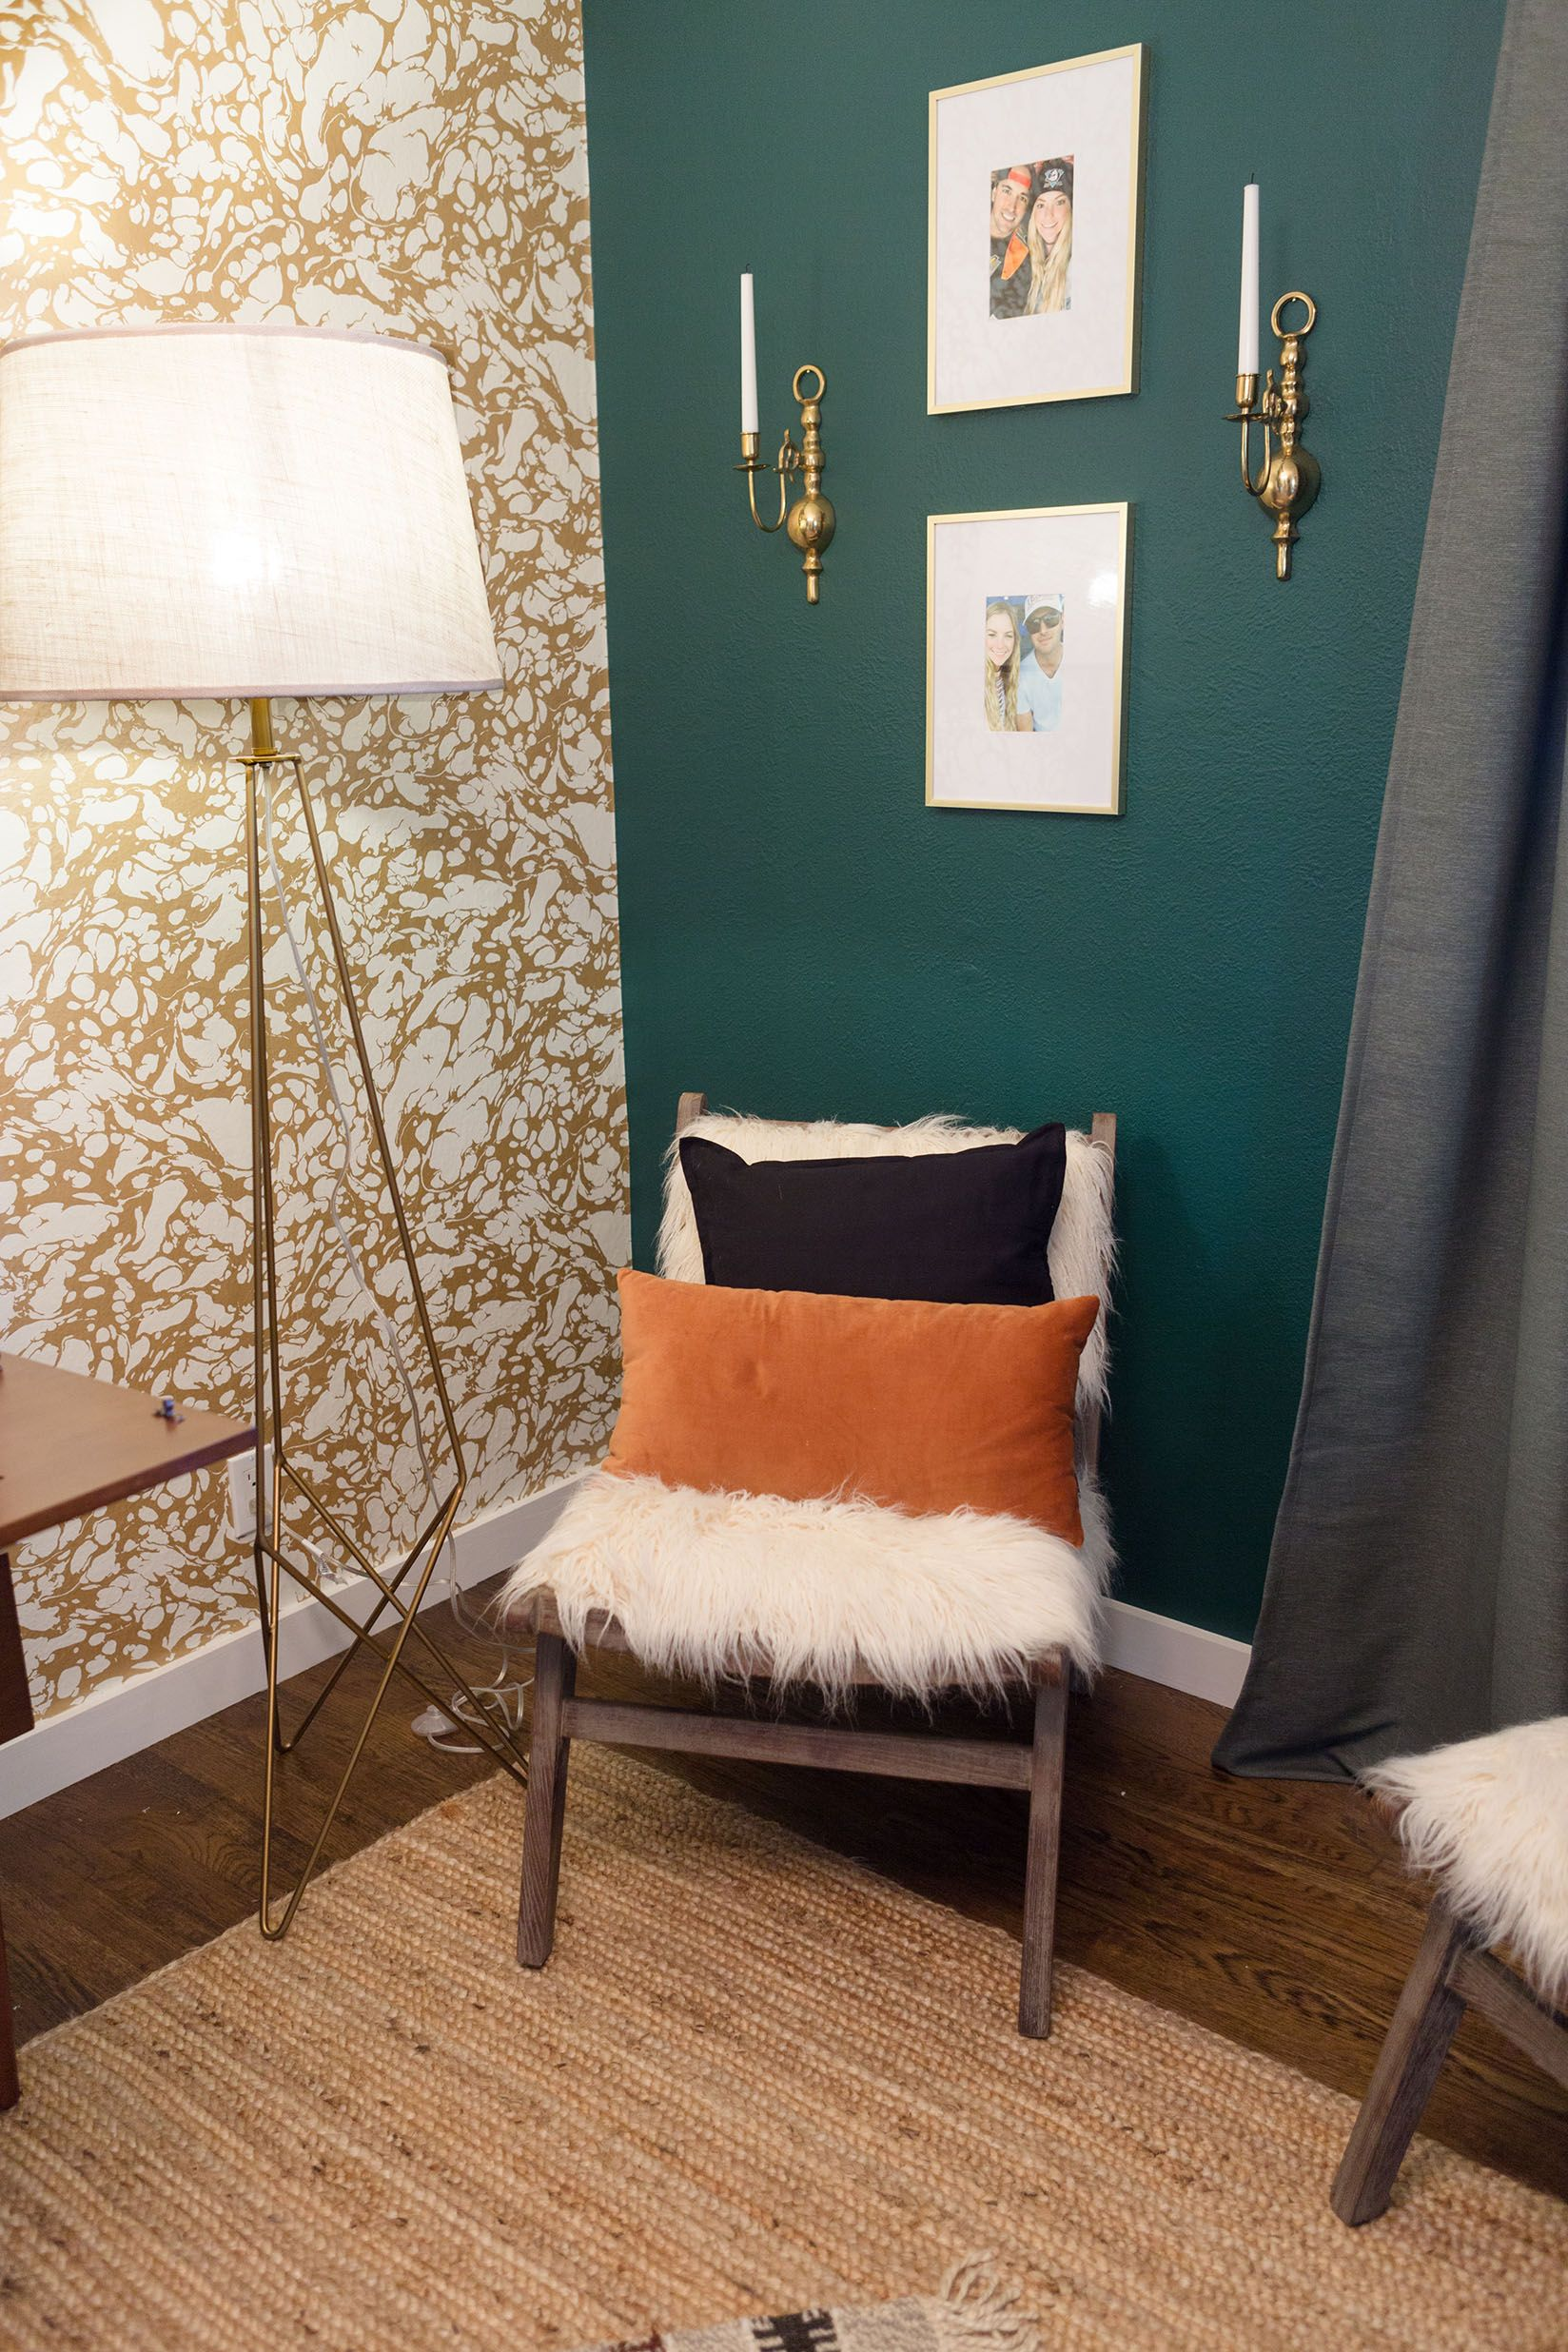 HGTVs Jasmine Roth Shares Night Watch Paint Tips